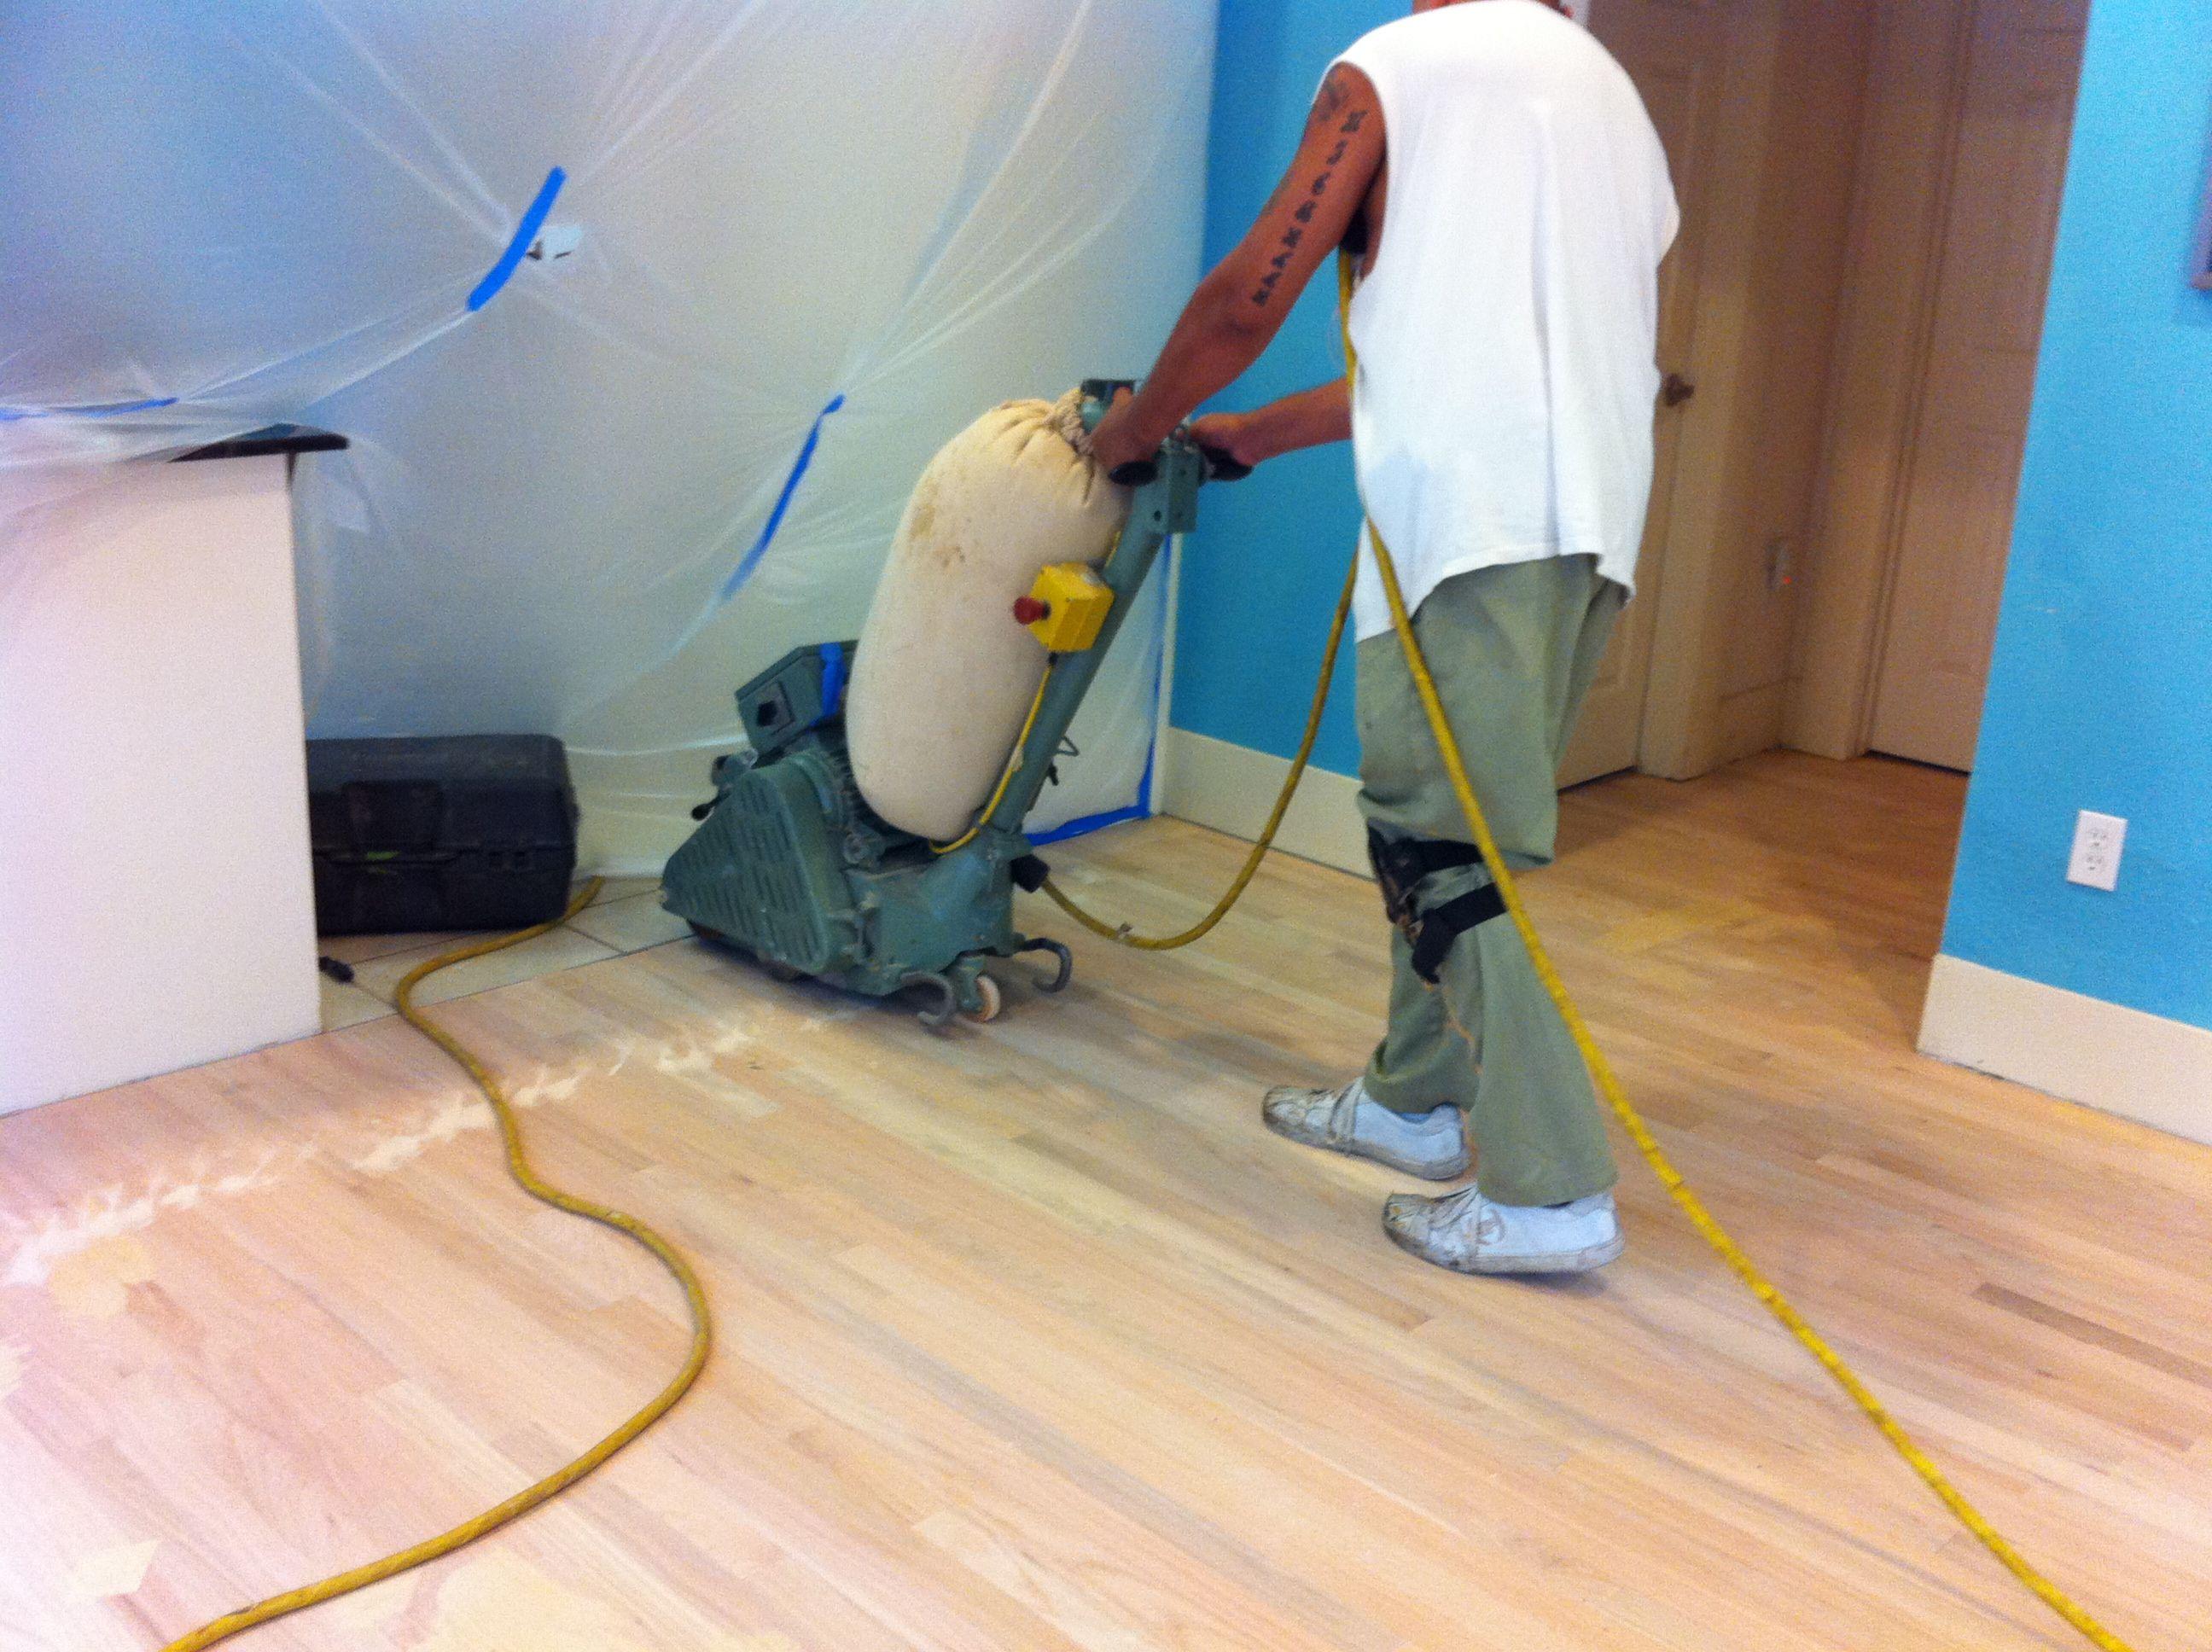 Columbus Floor Sanding | Hardwood Flooring | Columbus Floor Waxing  Polishing Cleaning Services